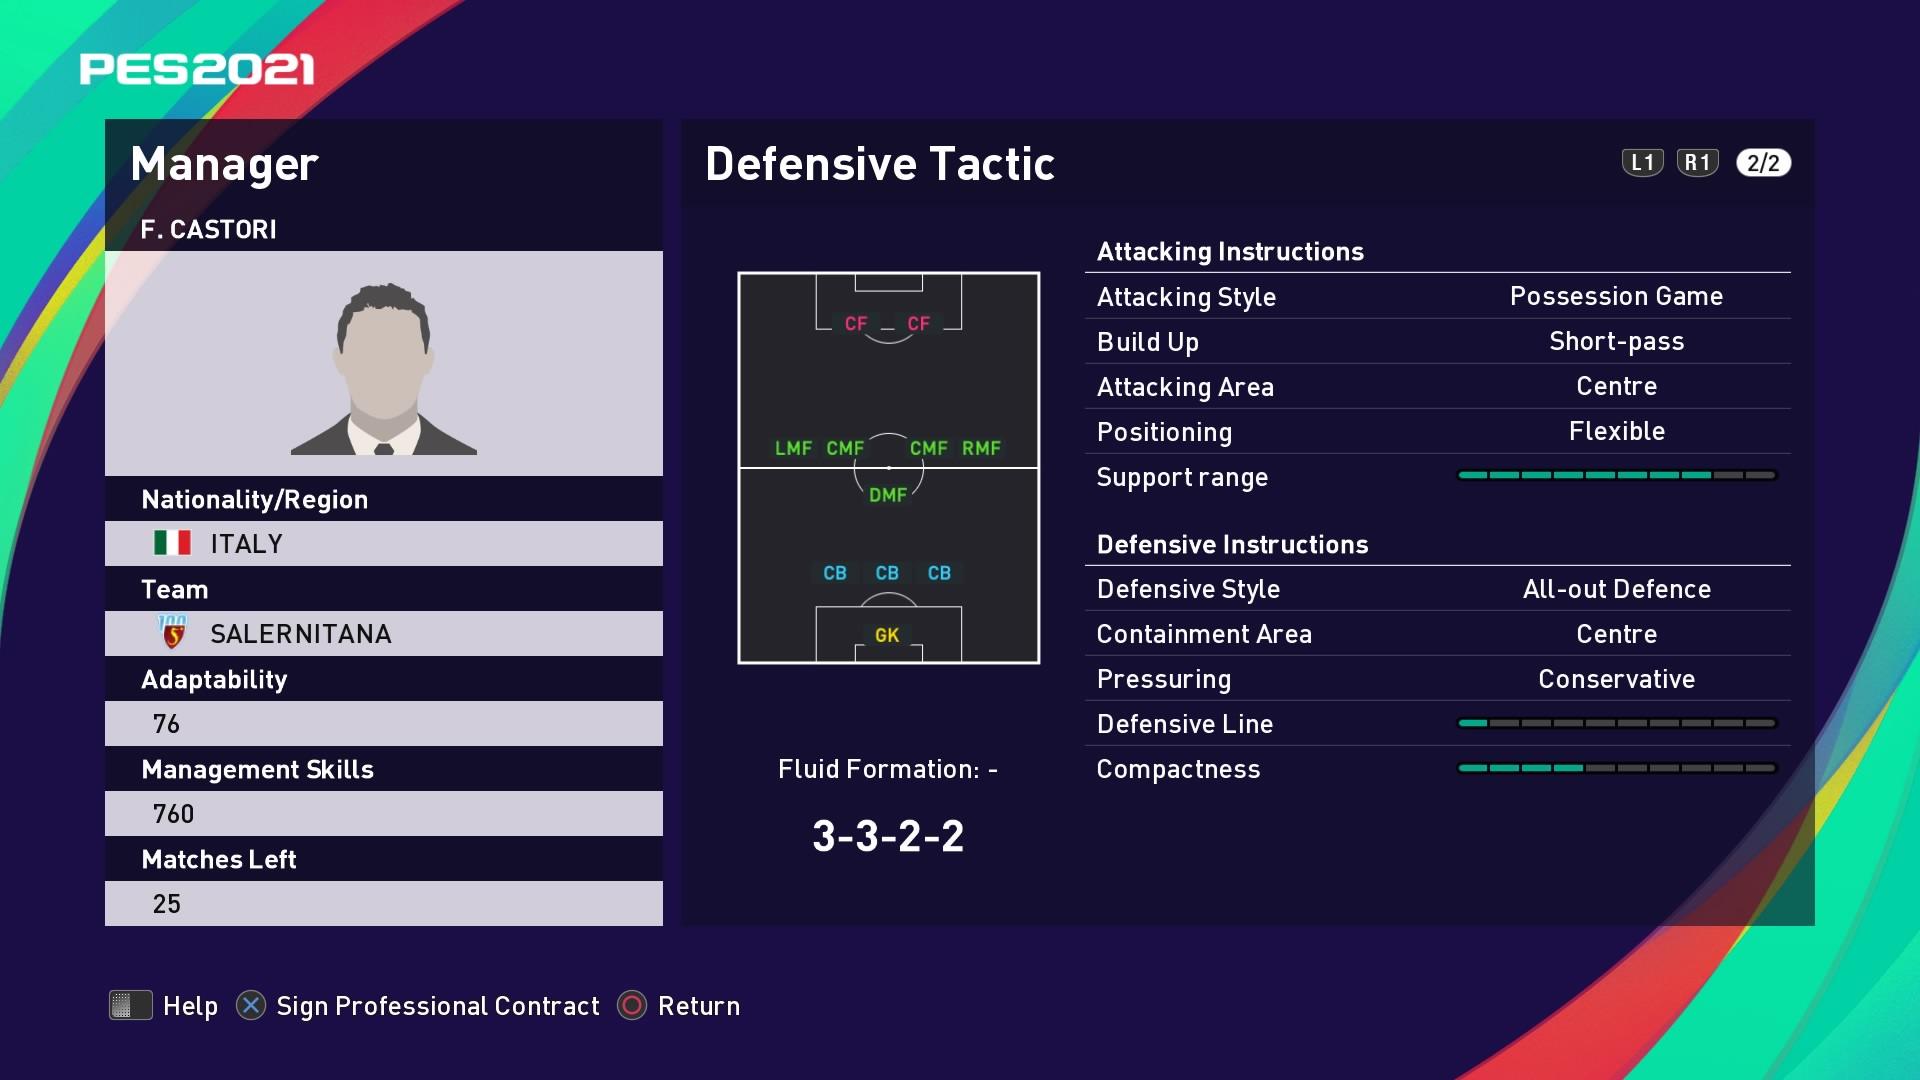 F. Castori (Fabrizio Castori) Defensive Tactic in PES 2021 myClub